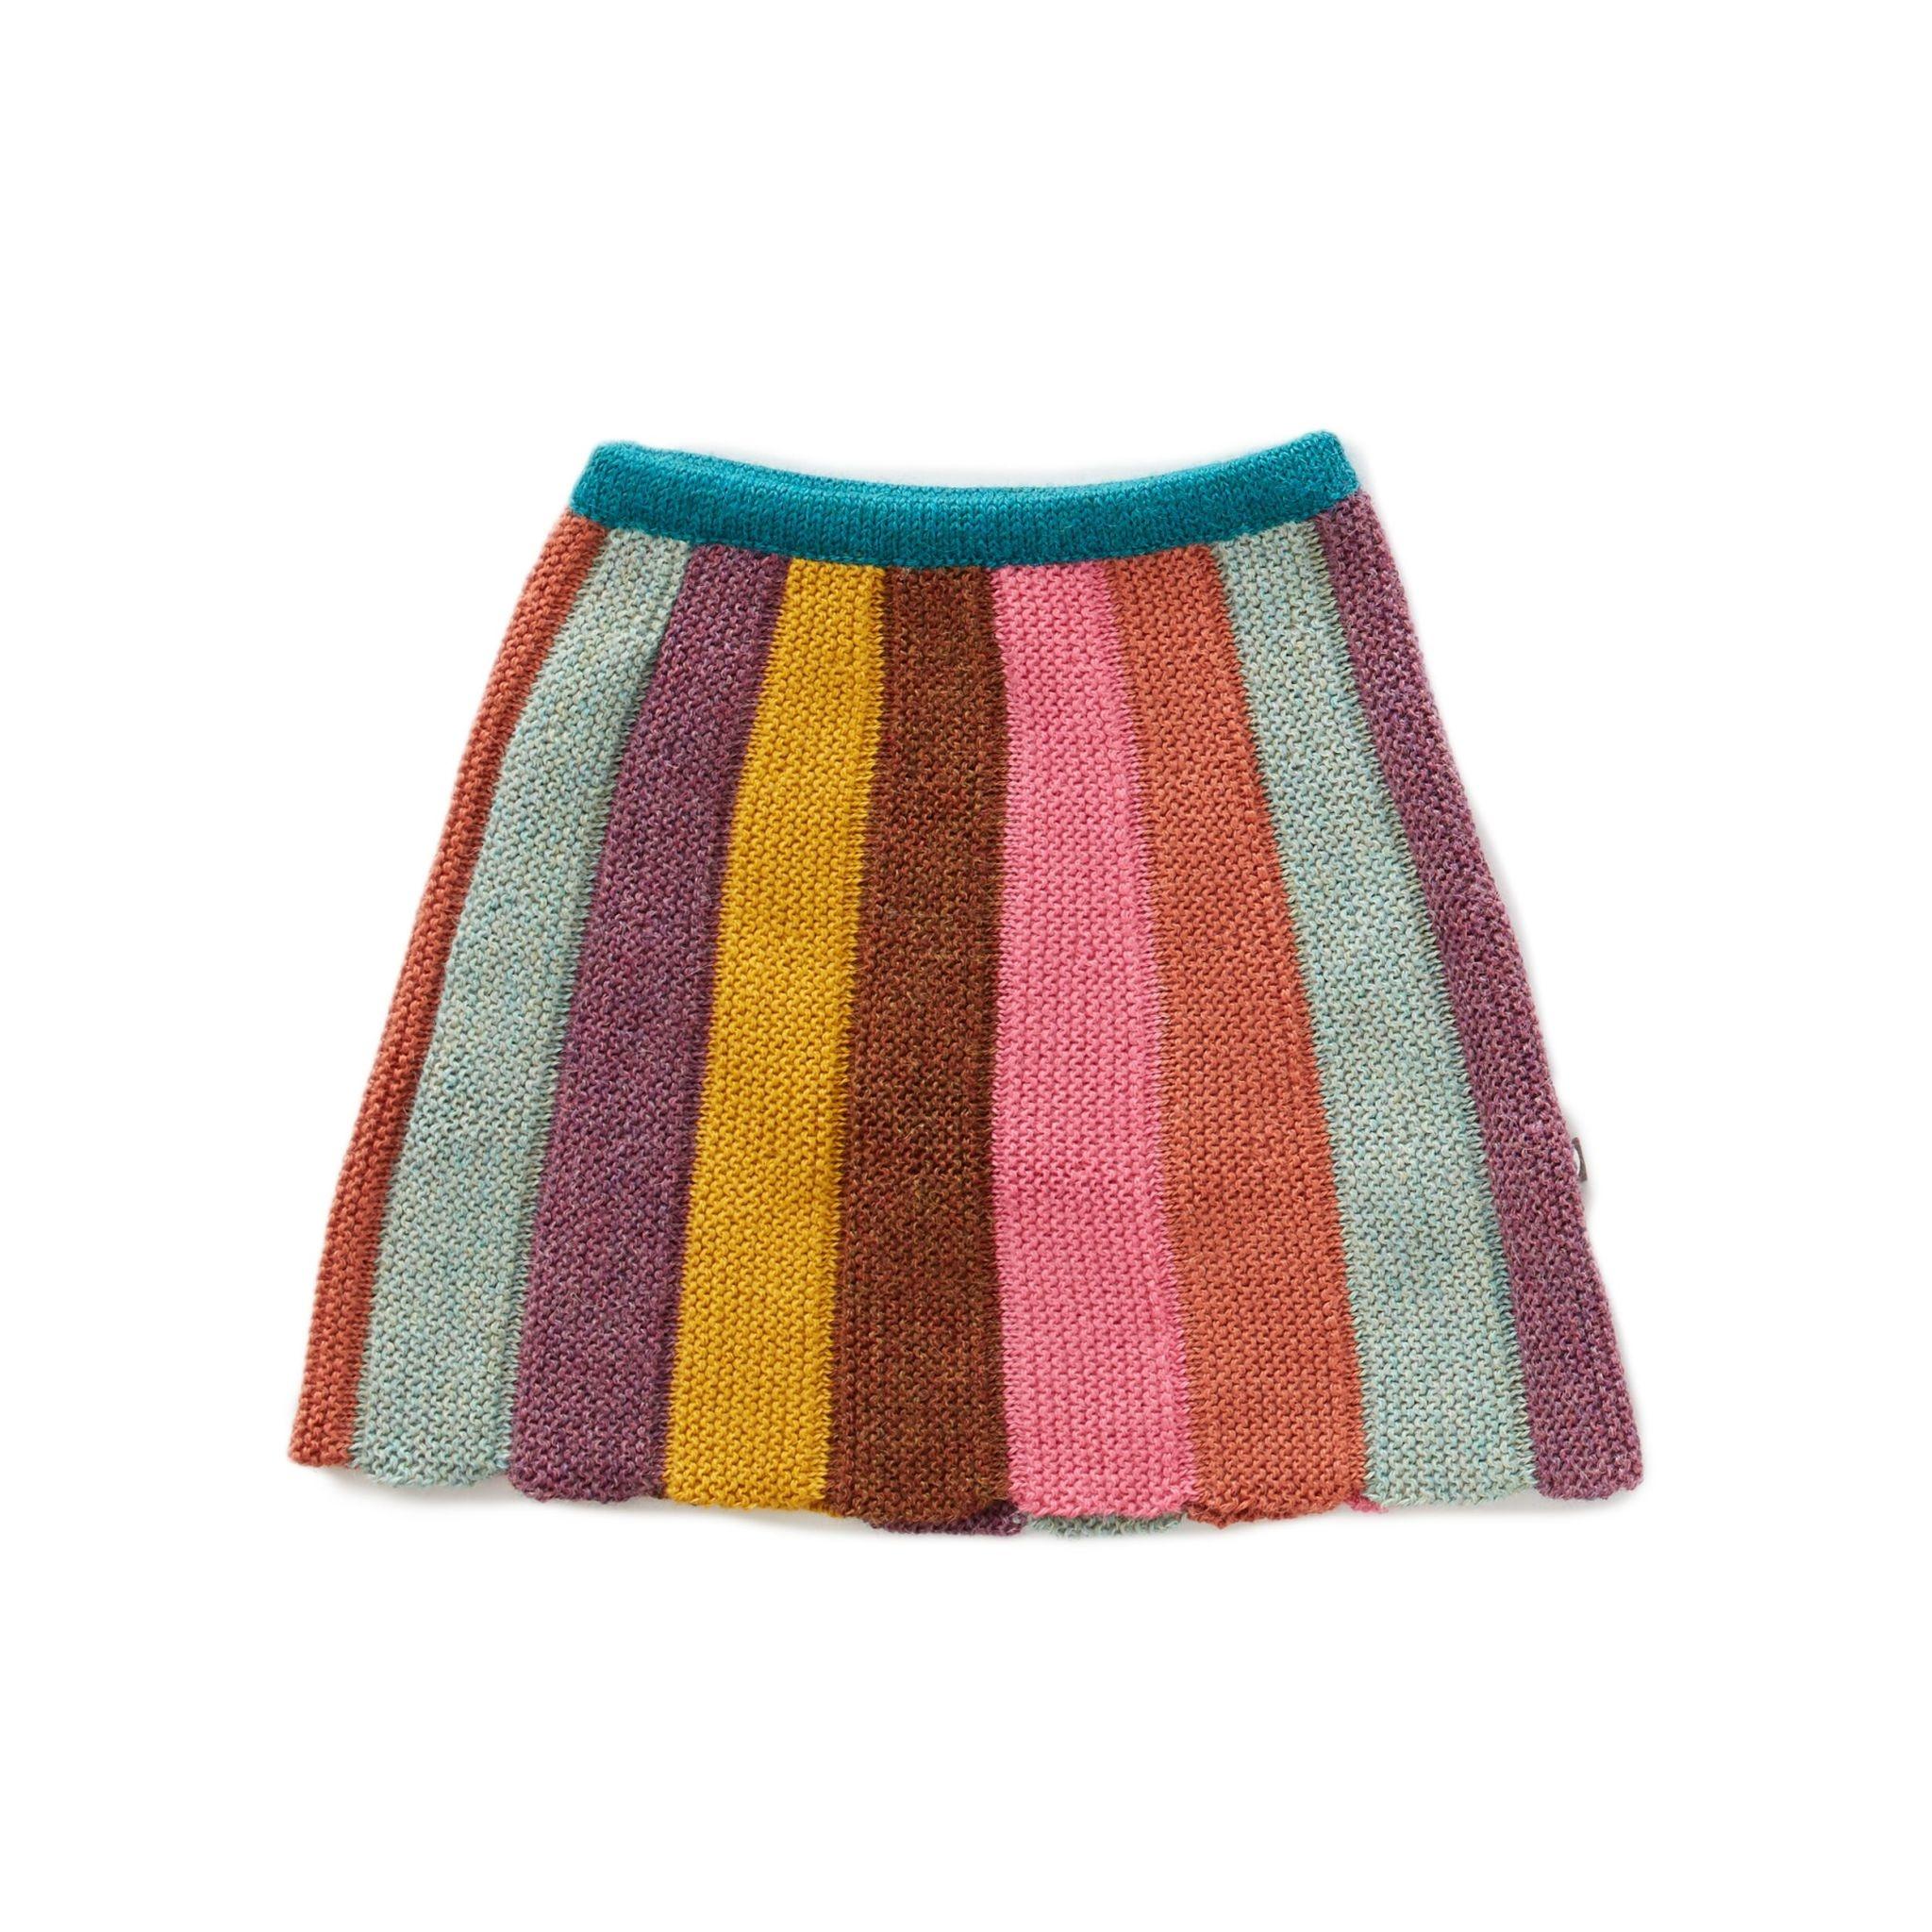 OEUF Everyday Skirt